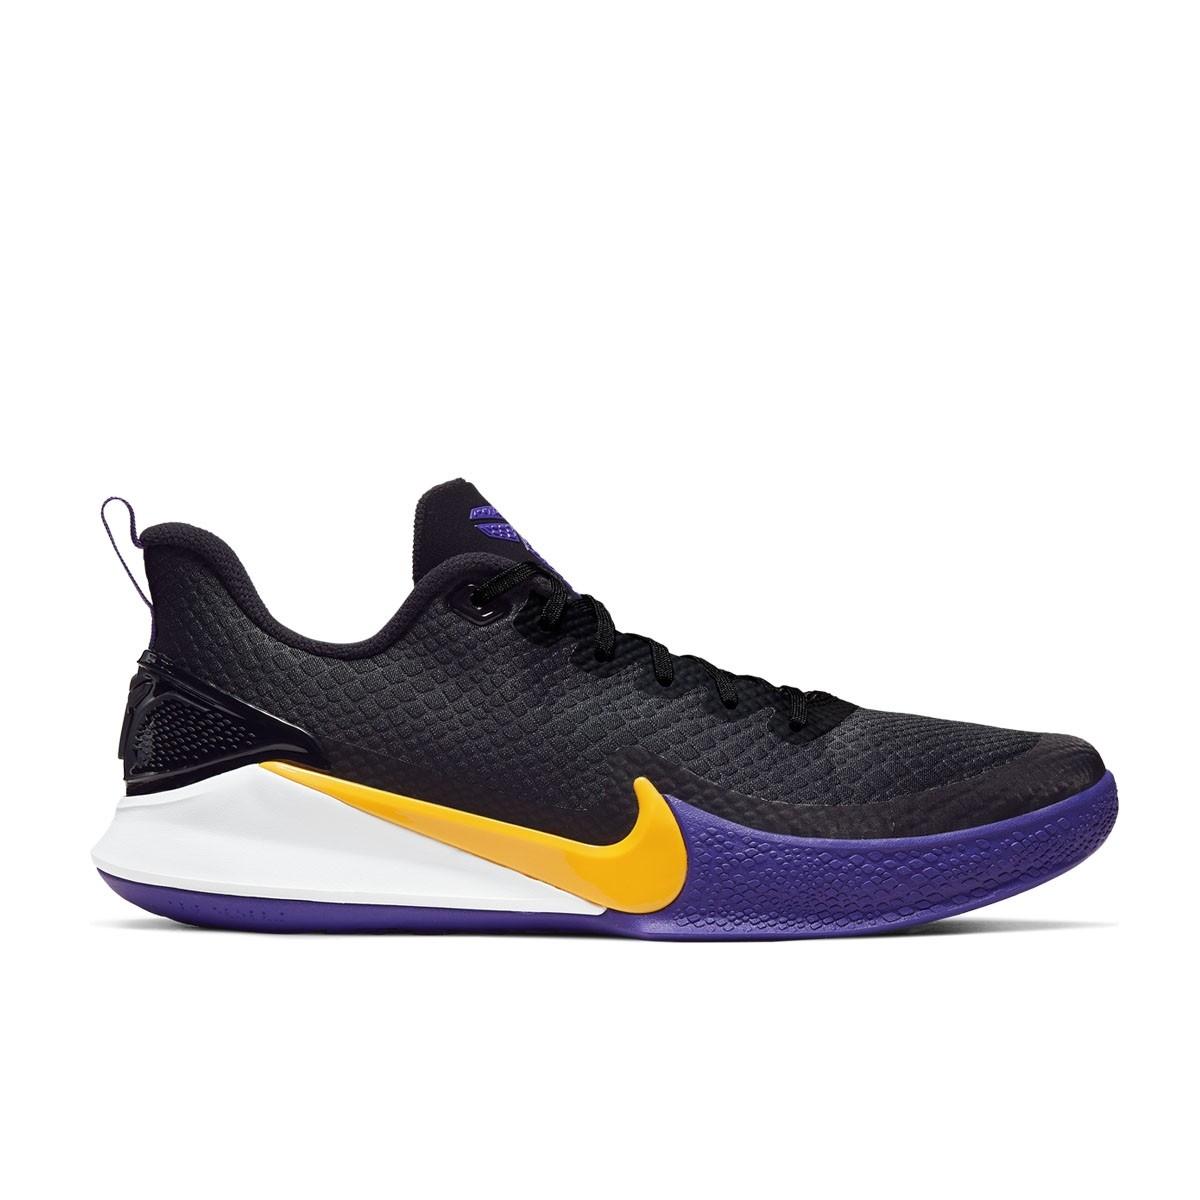 Nike Mamba Focus GS 'Lakers'